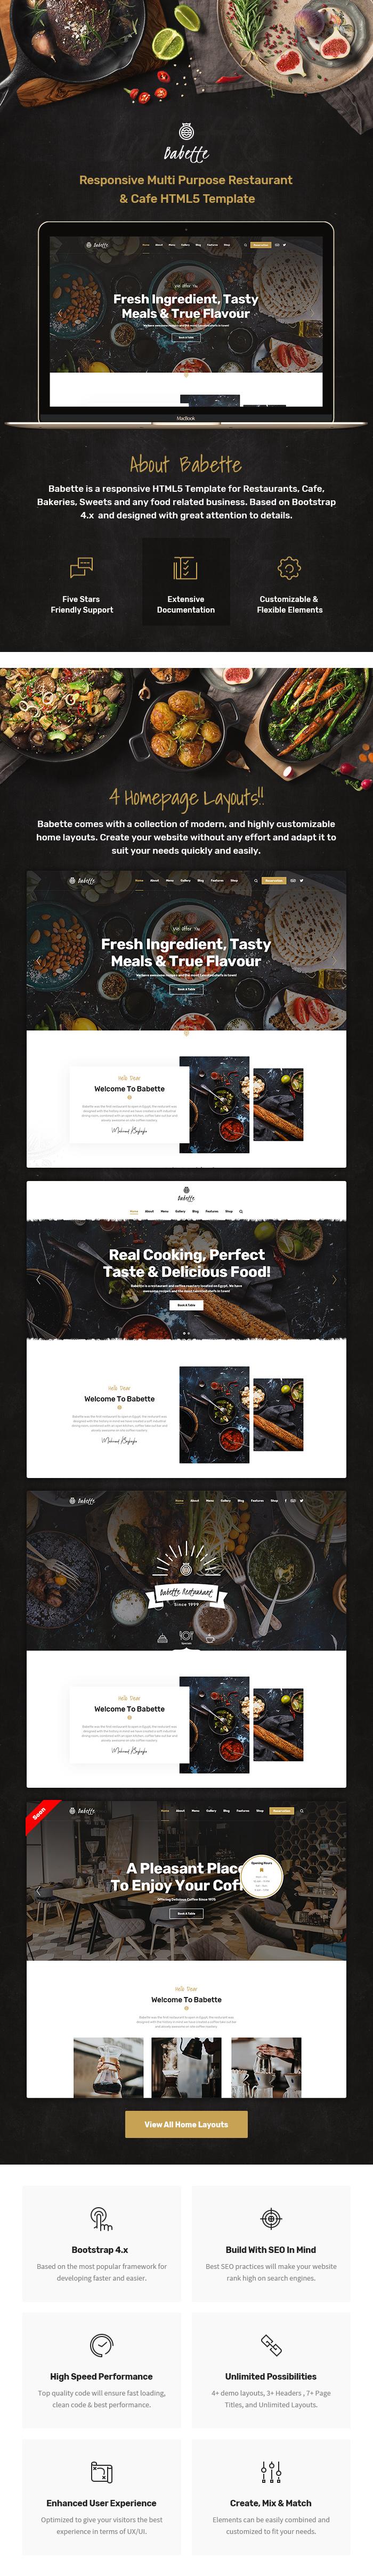 Babette - Restaurant & Cafe HTML5 Template - 2